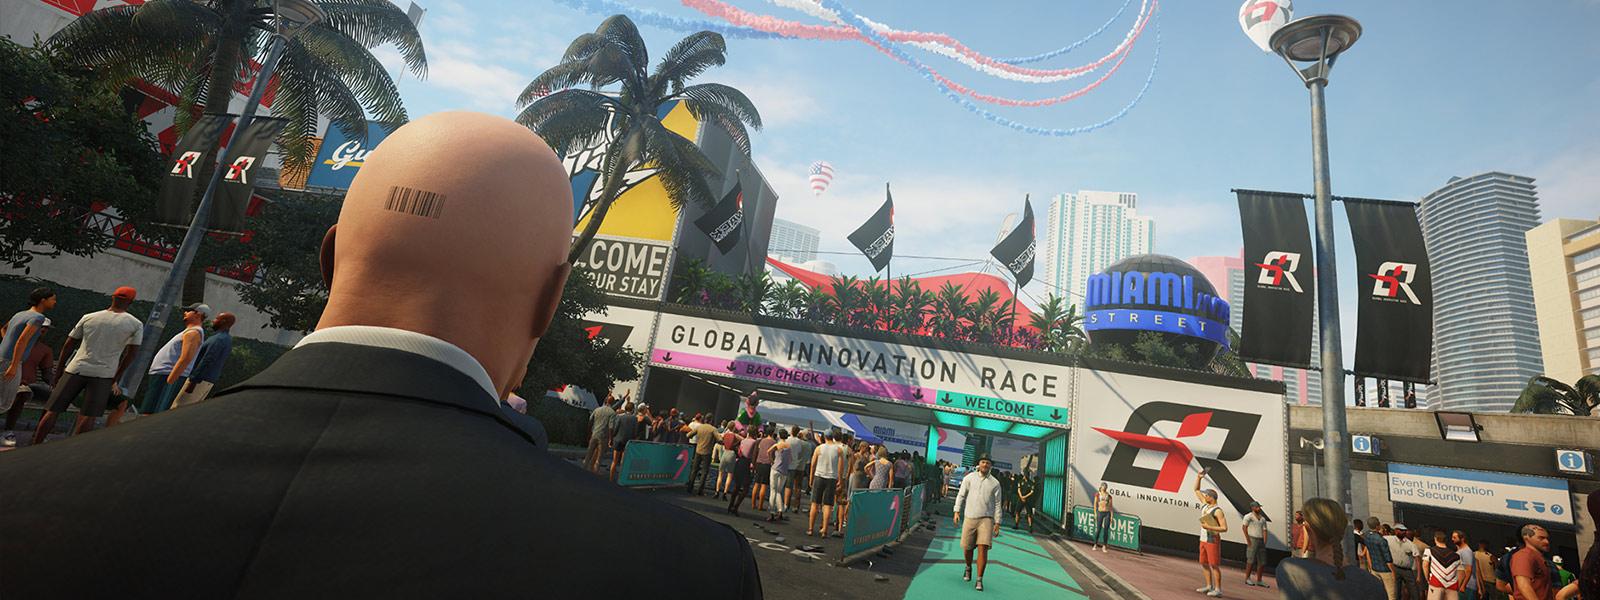 Miami의 경기장 입구에서 사람들이 붐비는 곳에 서 있는 Agent 47의 뒷모습